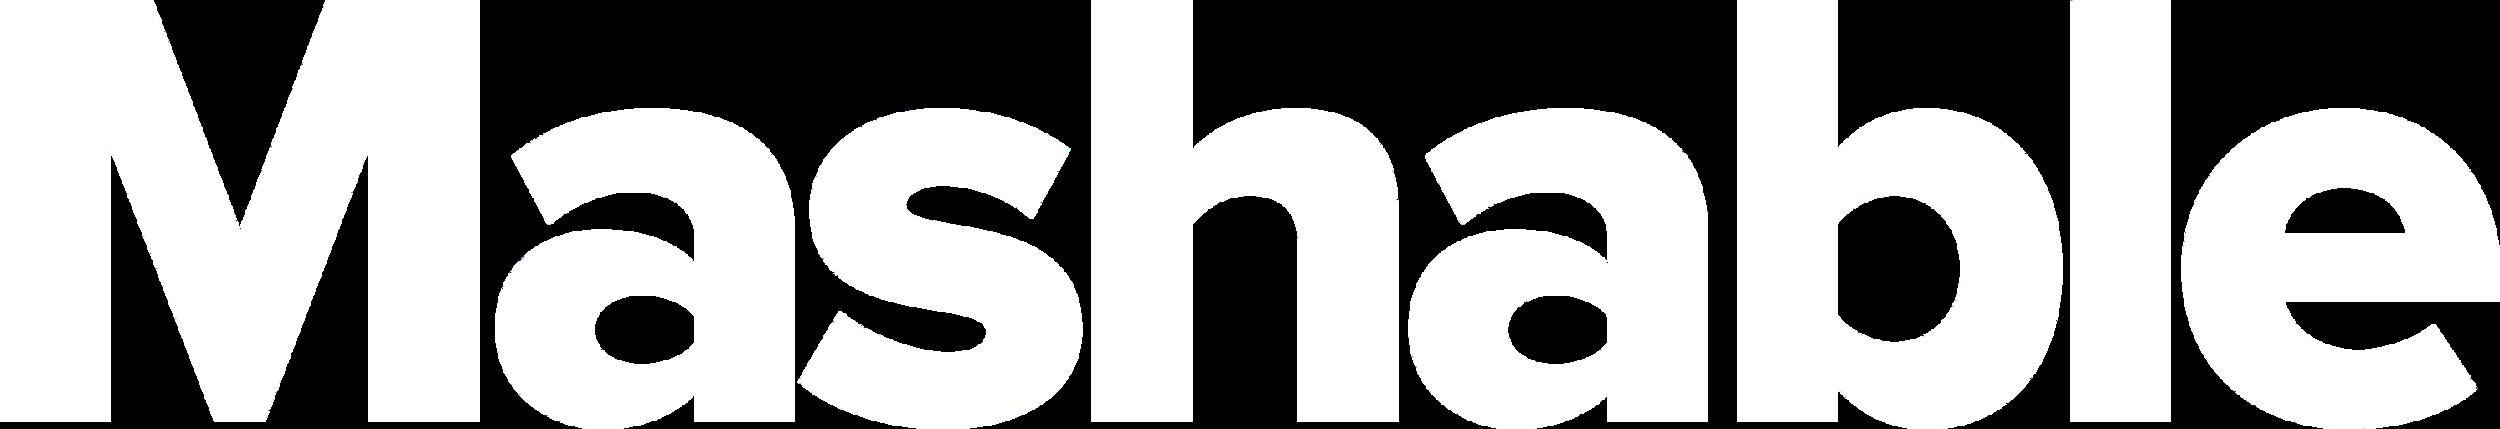 Mashable-white.png